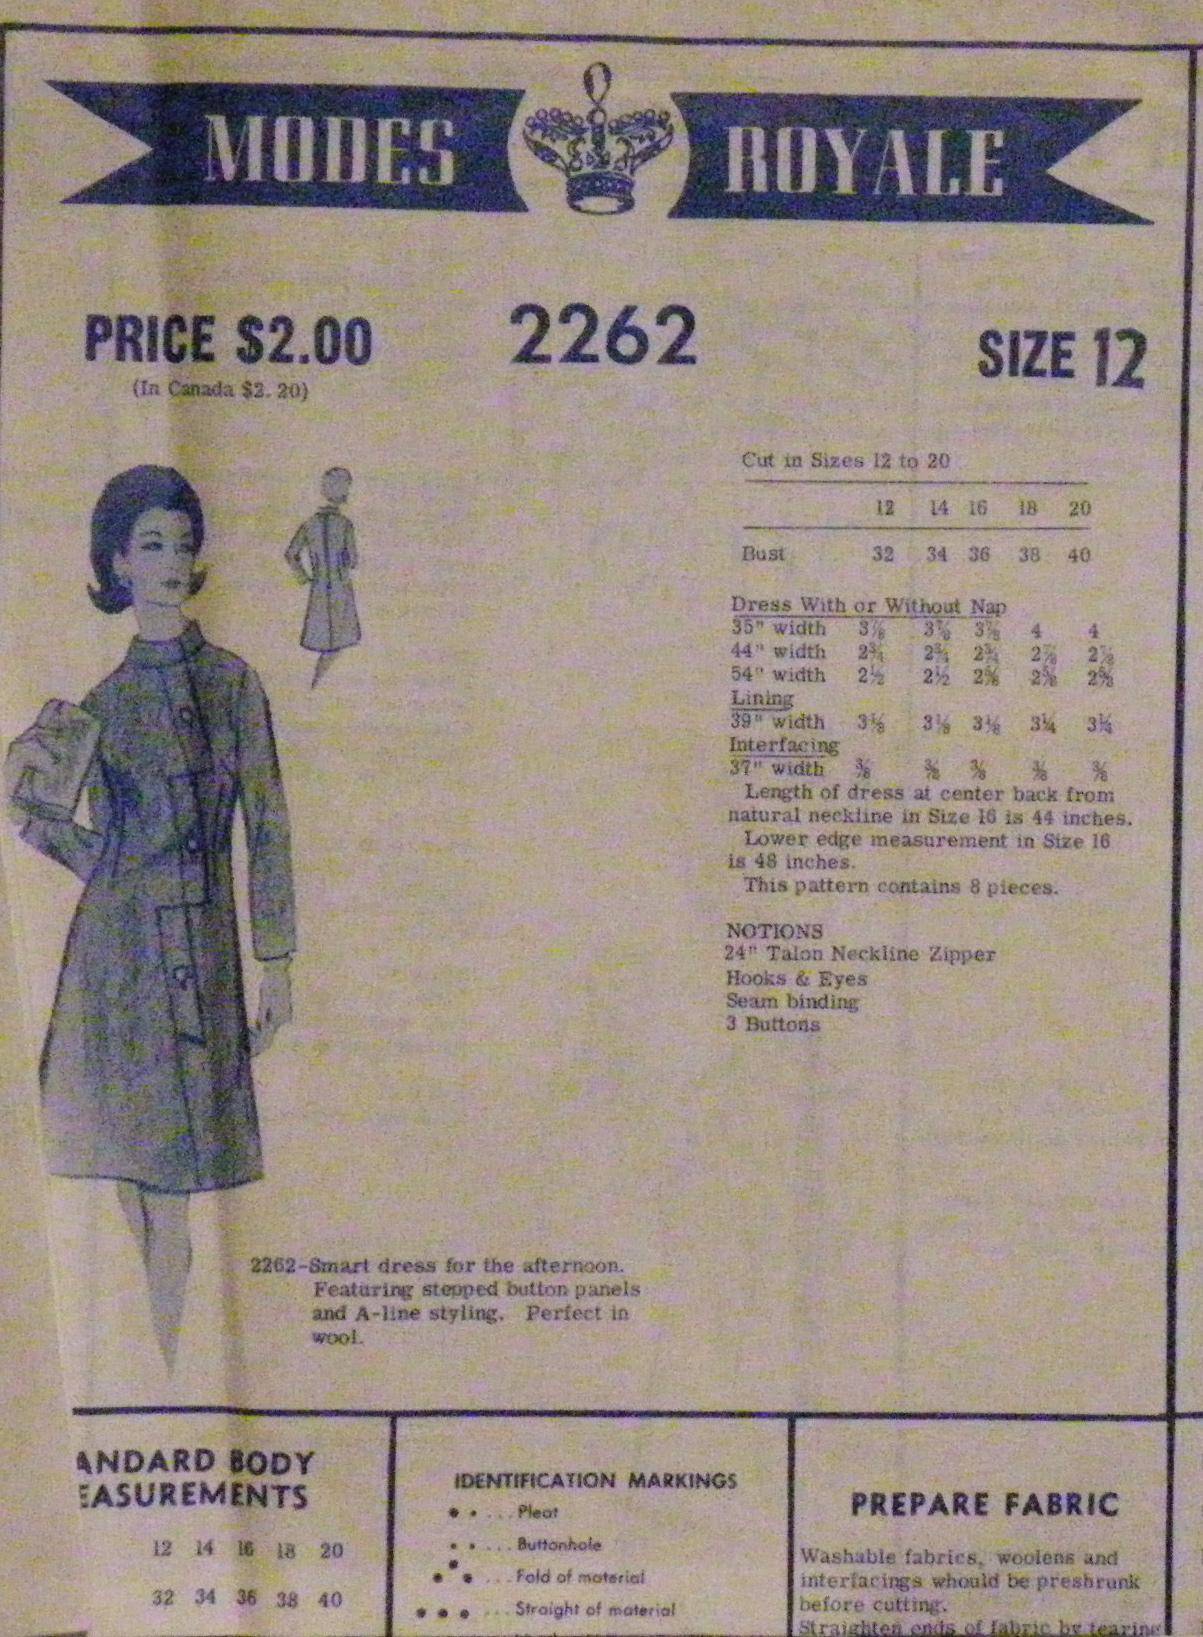 Modes Royale 2262